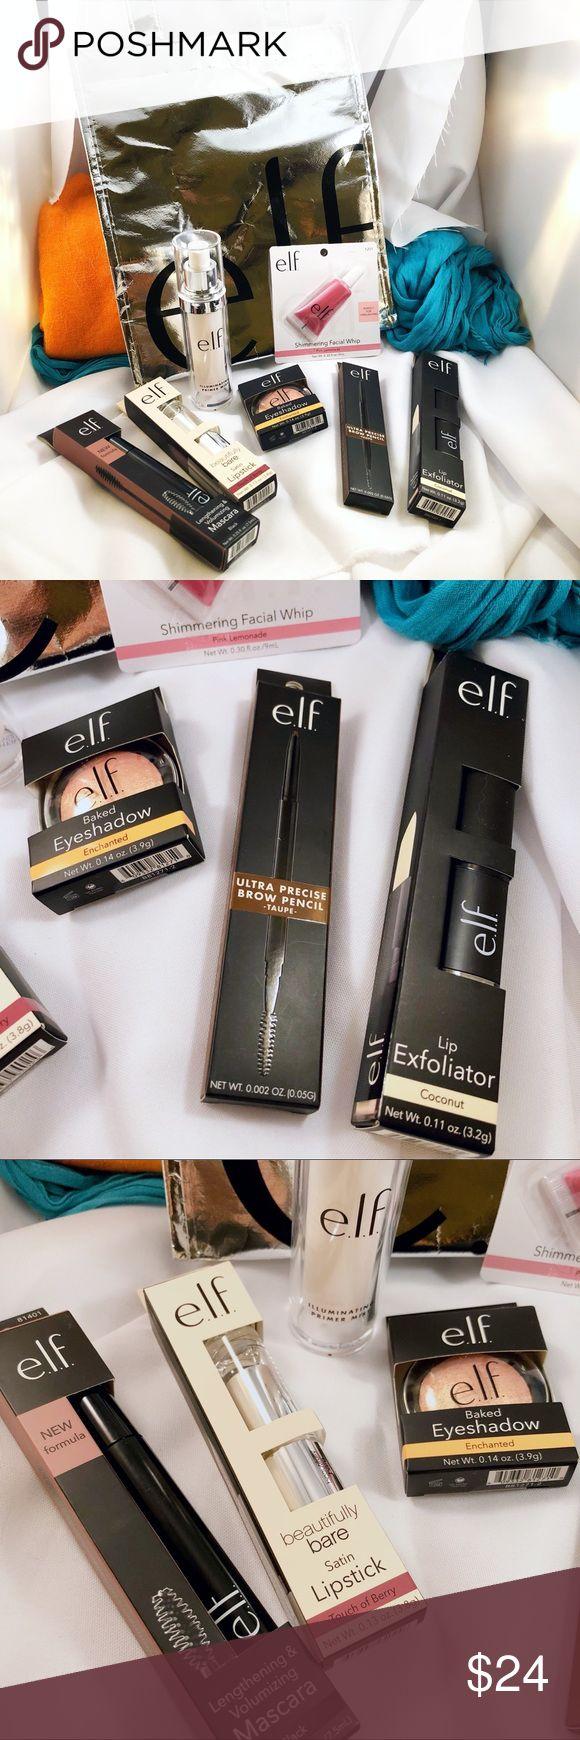 "ELF Cosmetics Custom ""BEST OF"" Bundle 3 All brand new"